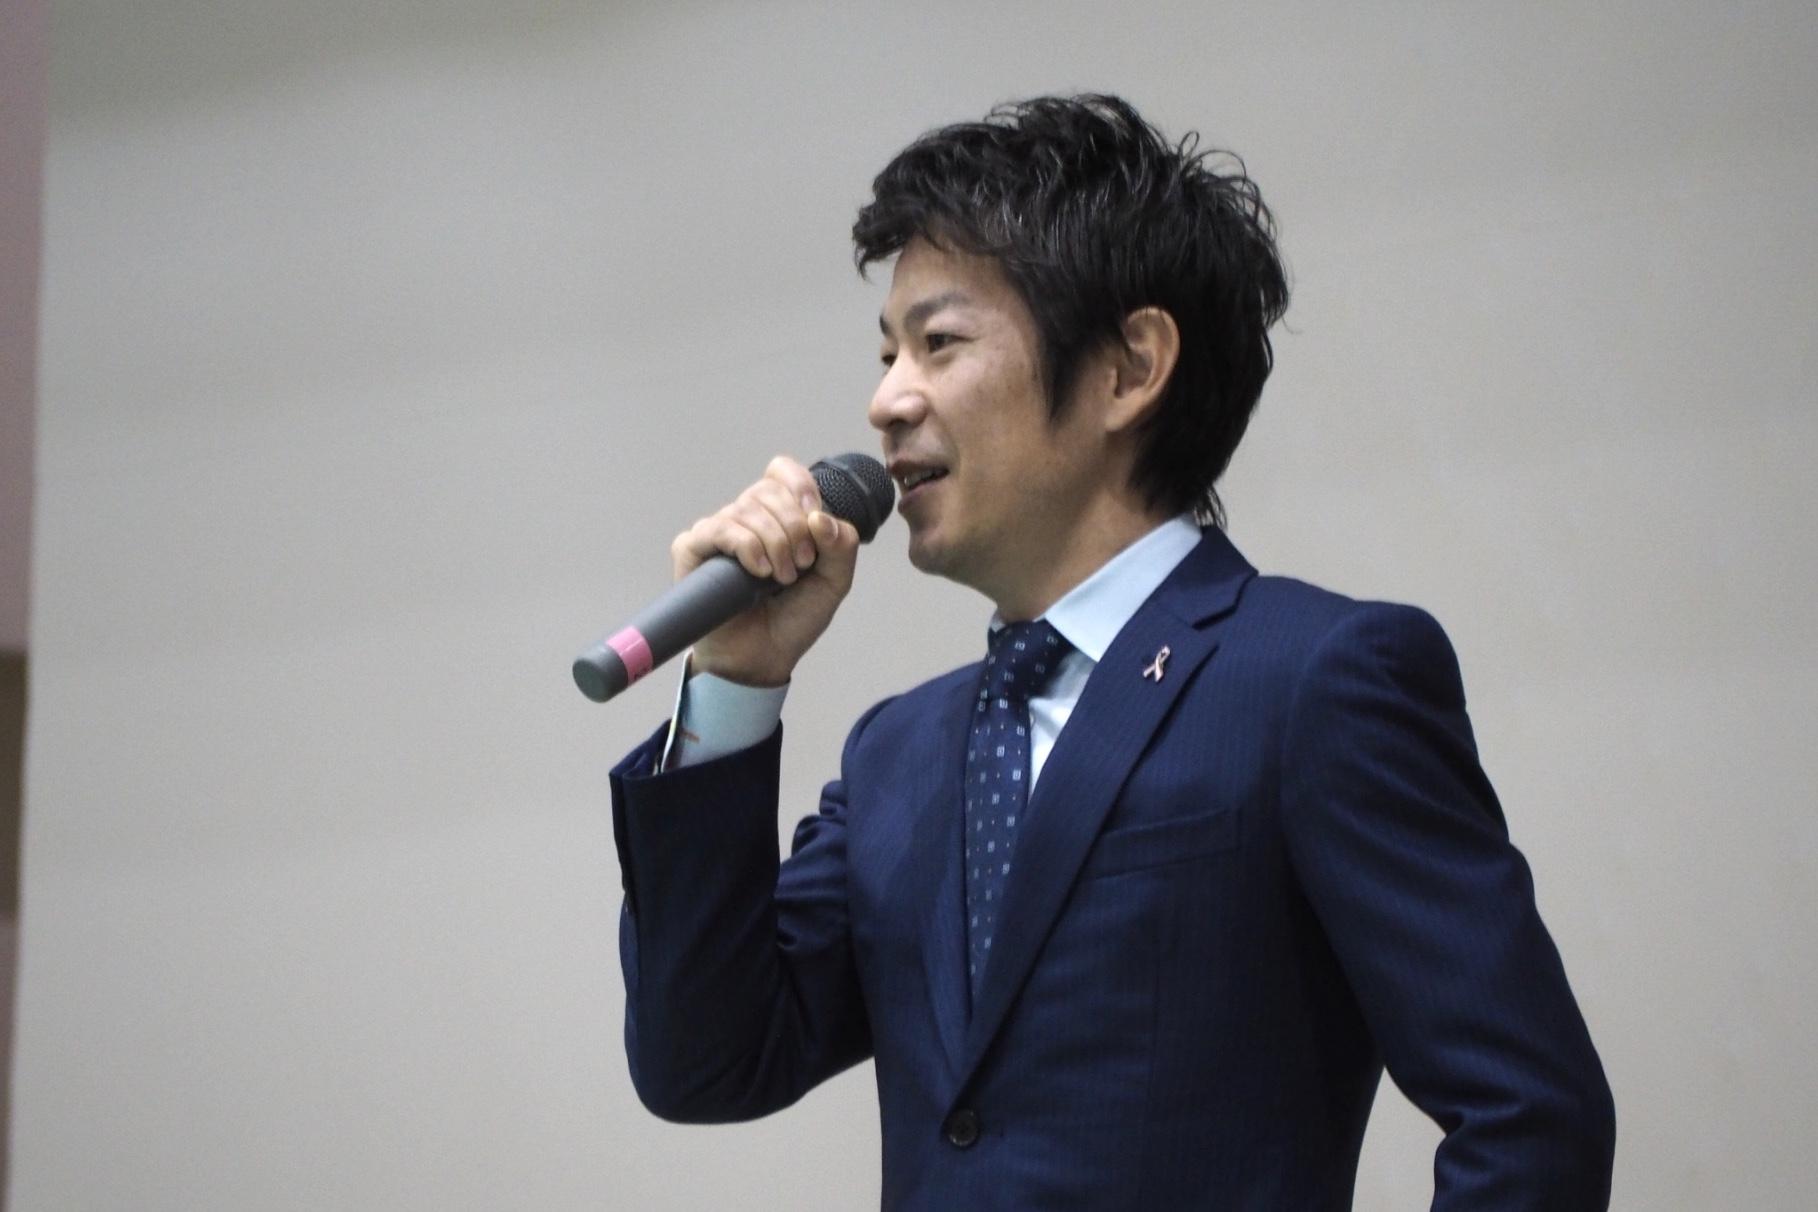 高知県で清水健講演会